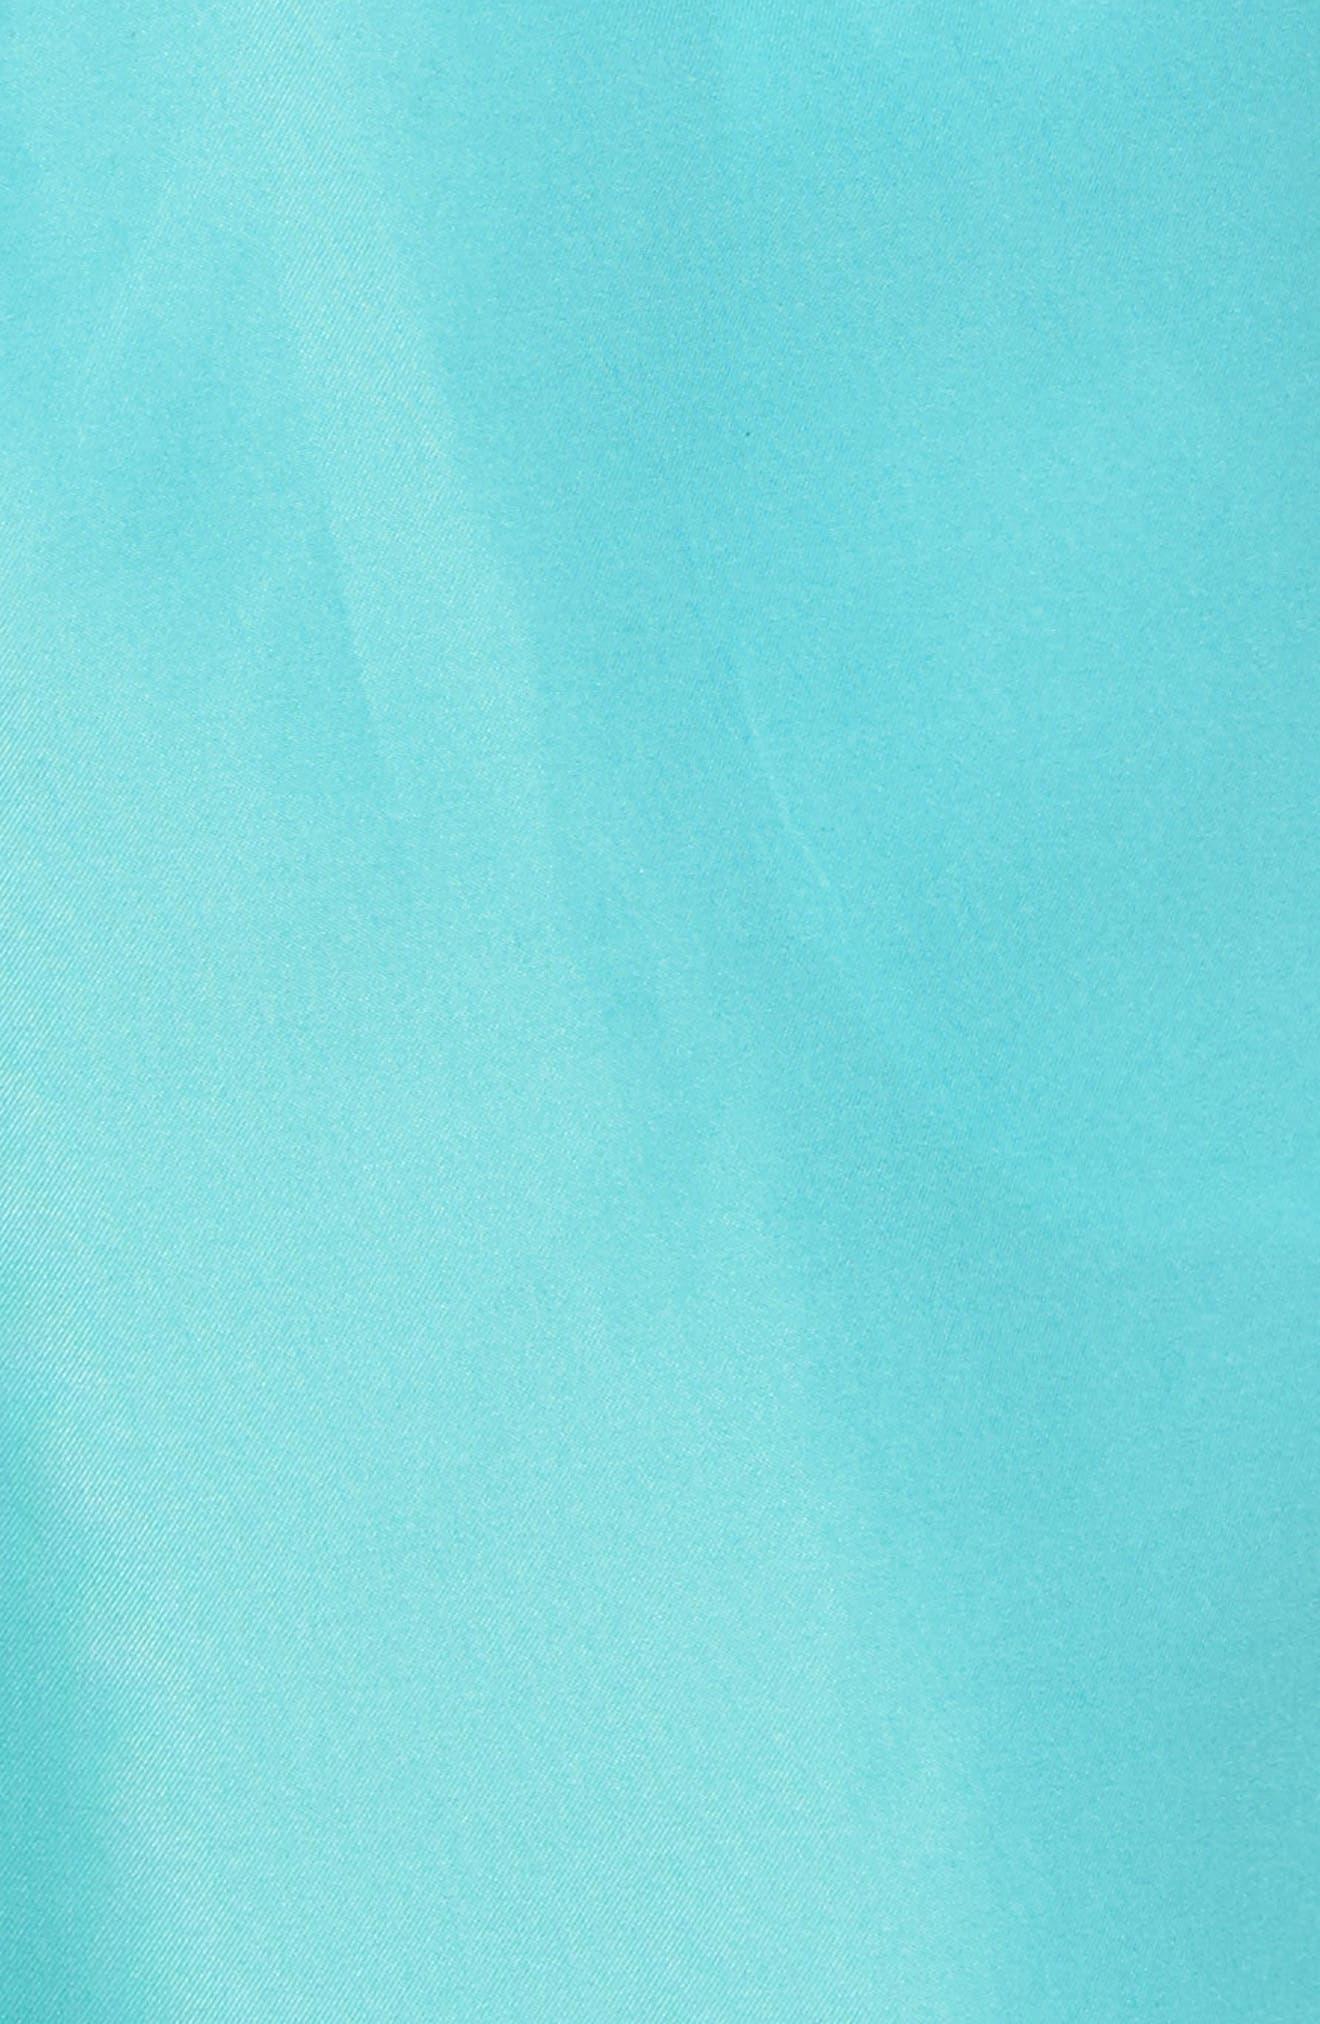 San O Swim Trunks,                             Alternate thumbnail 5, color,                             Sea Green/ White